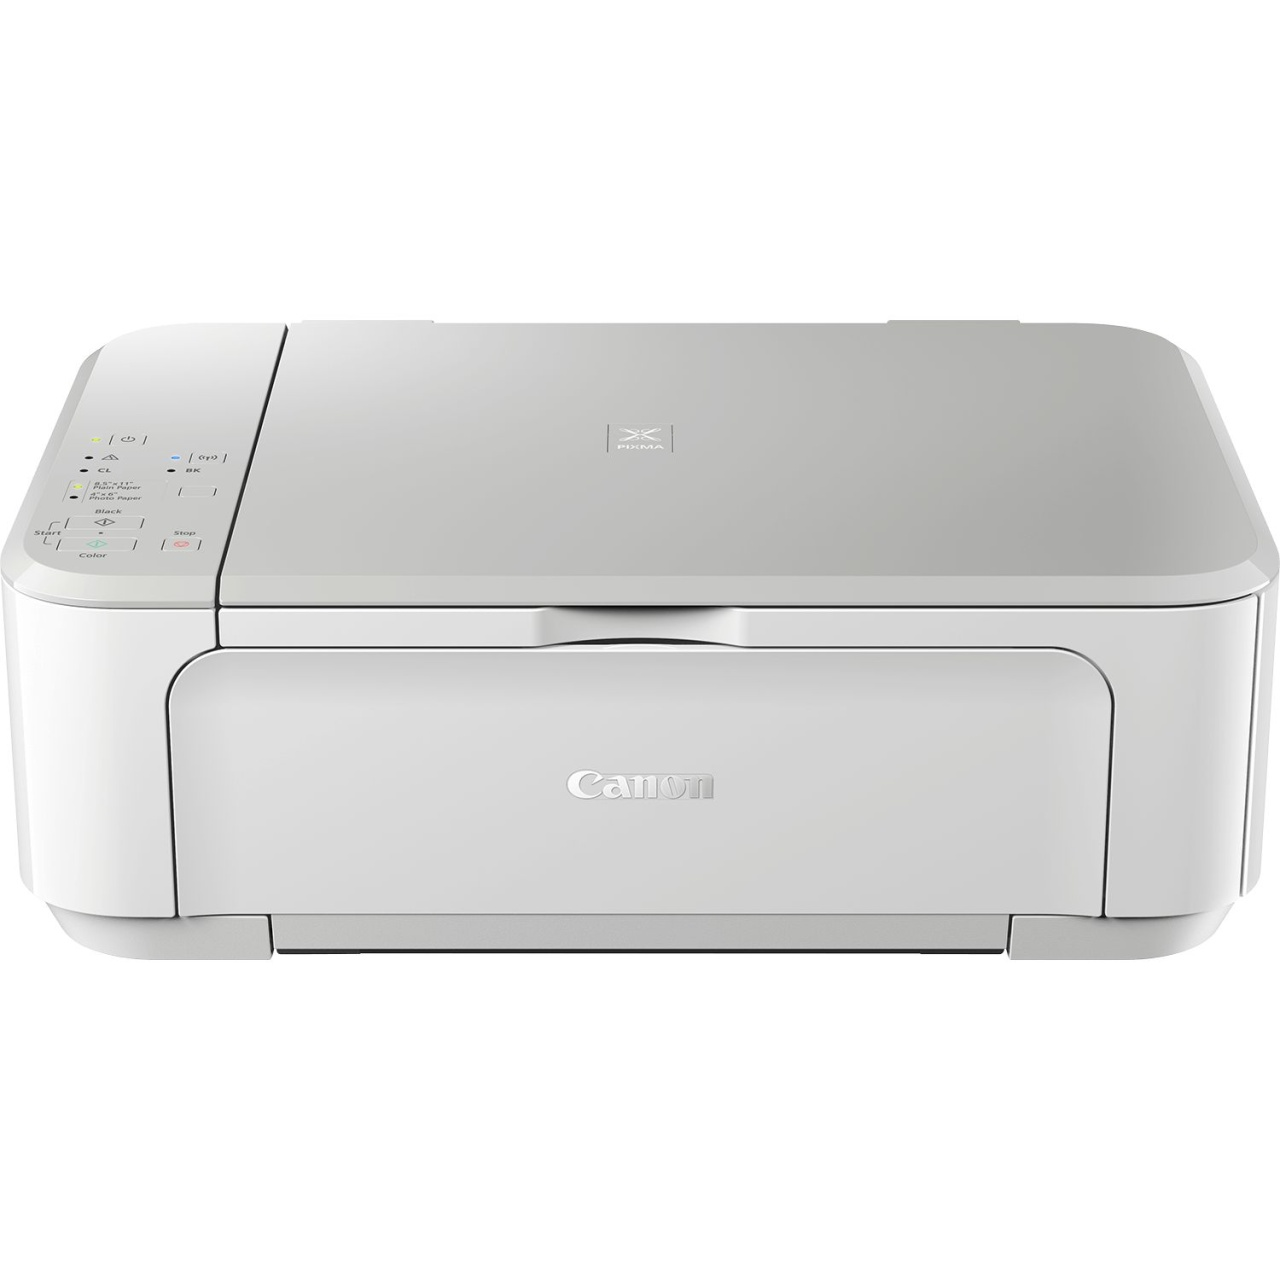 Canon PIXMA MG3650 Tinten-Multifunktionsdrucker, weiß